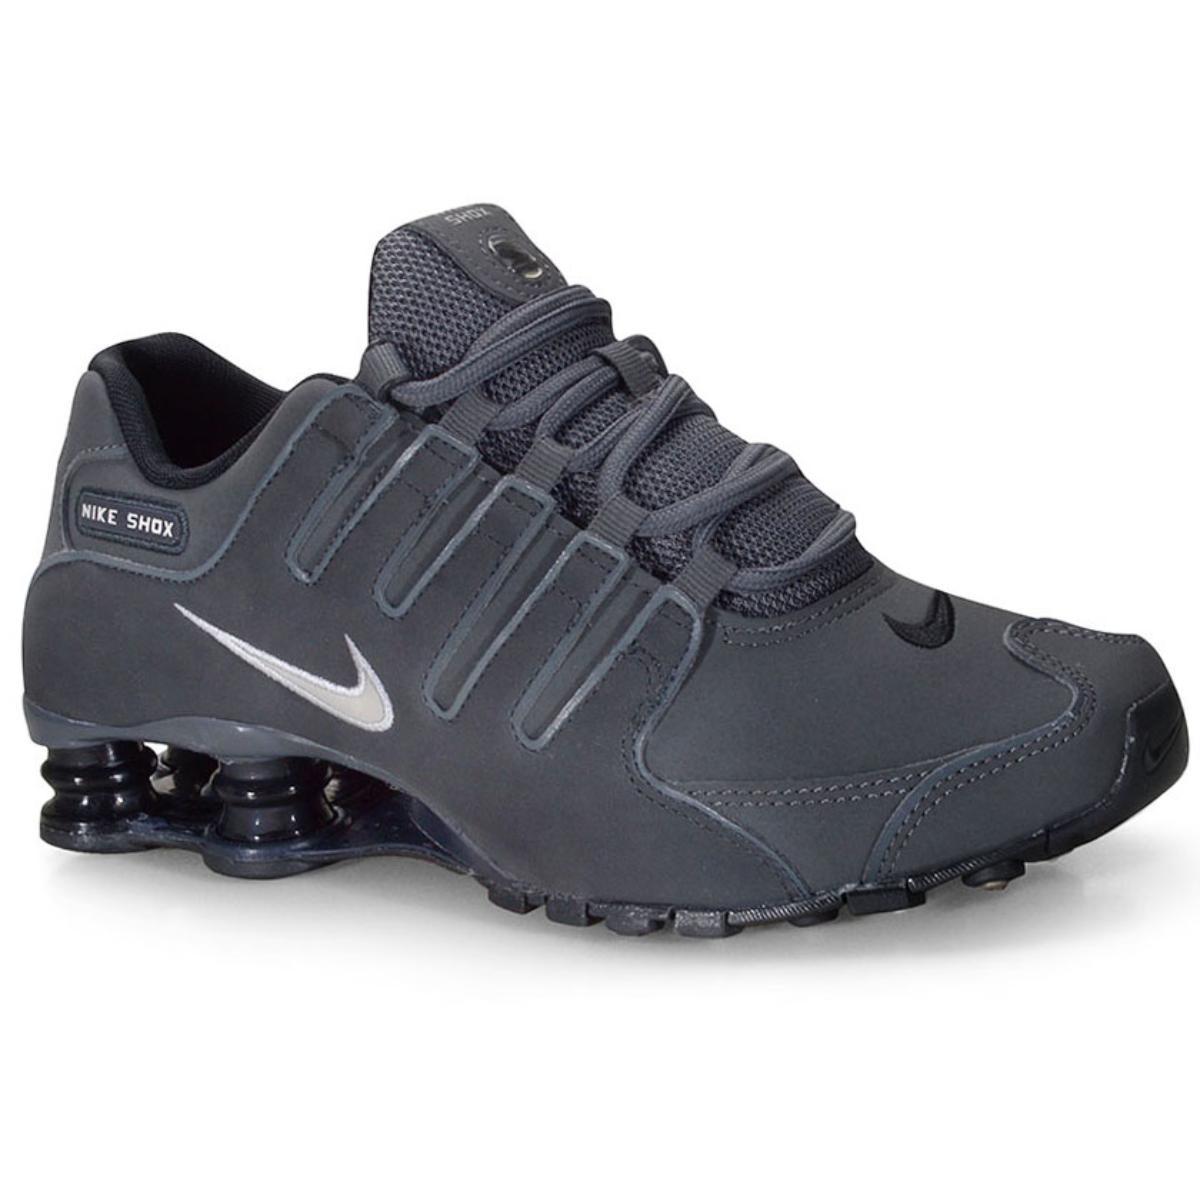 Tênis Masculino Nike 378341-059 Shox nz  Grafite